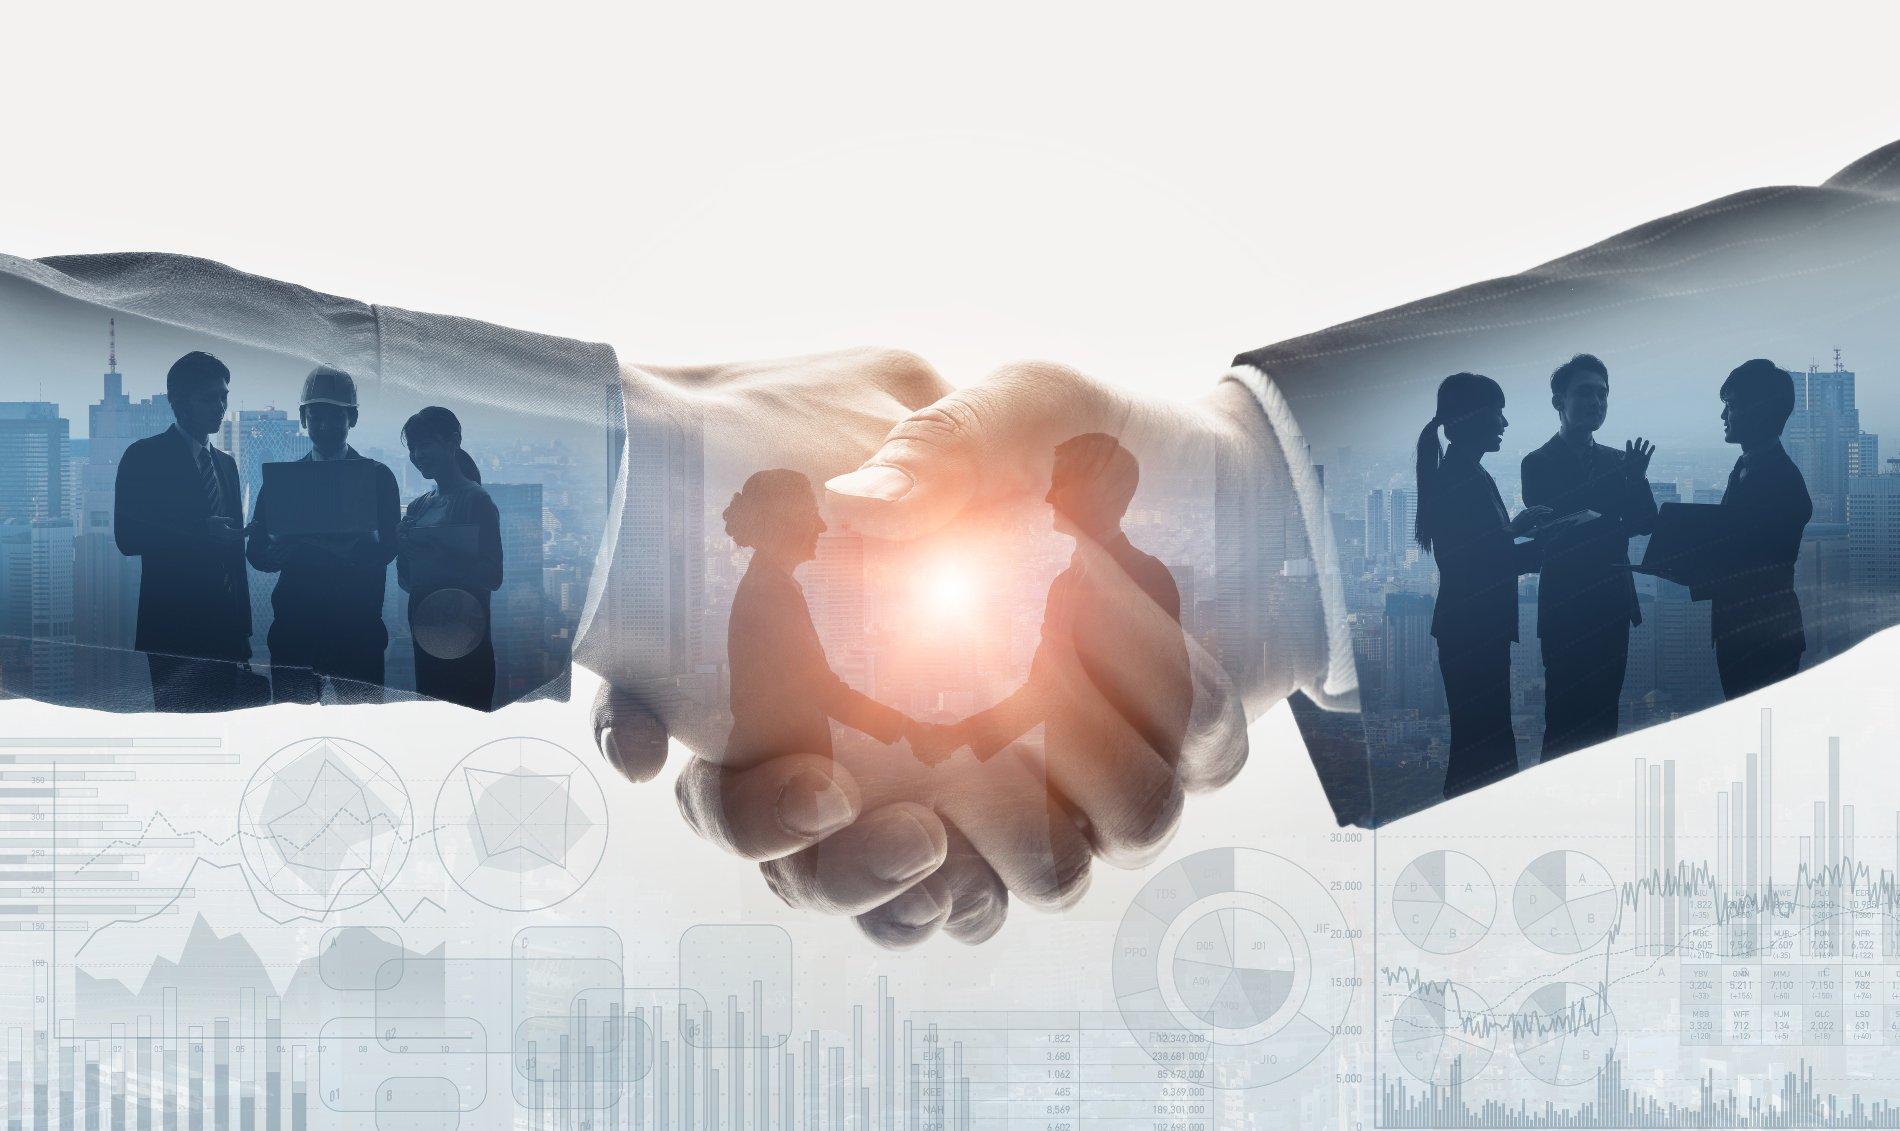 Benötigen wir in der digitalen Welt noch Verkäufer?